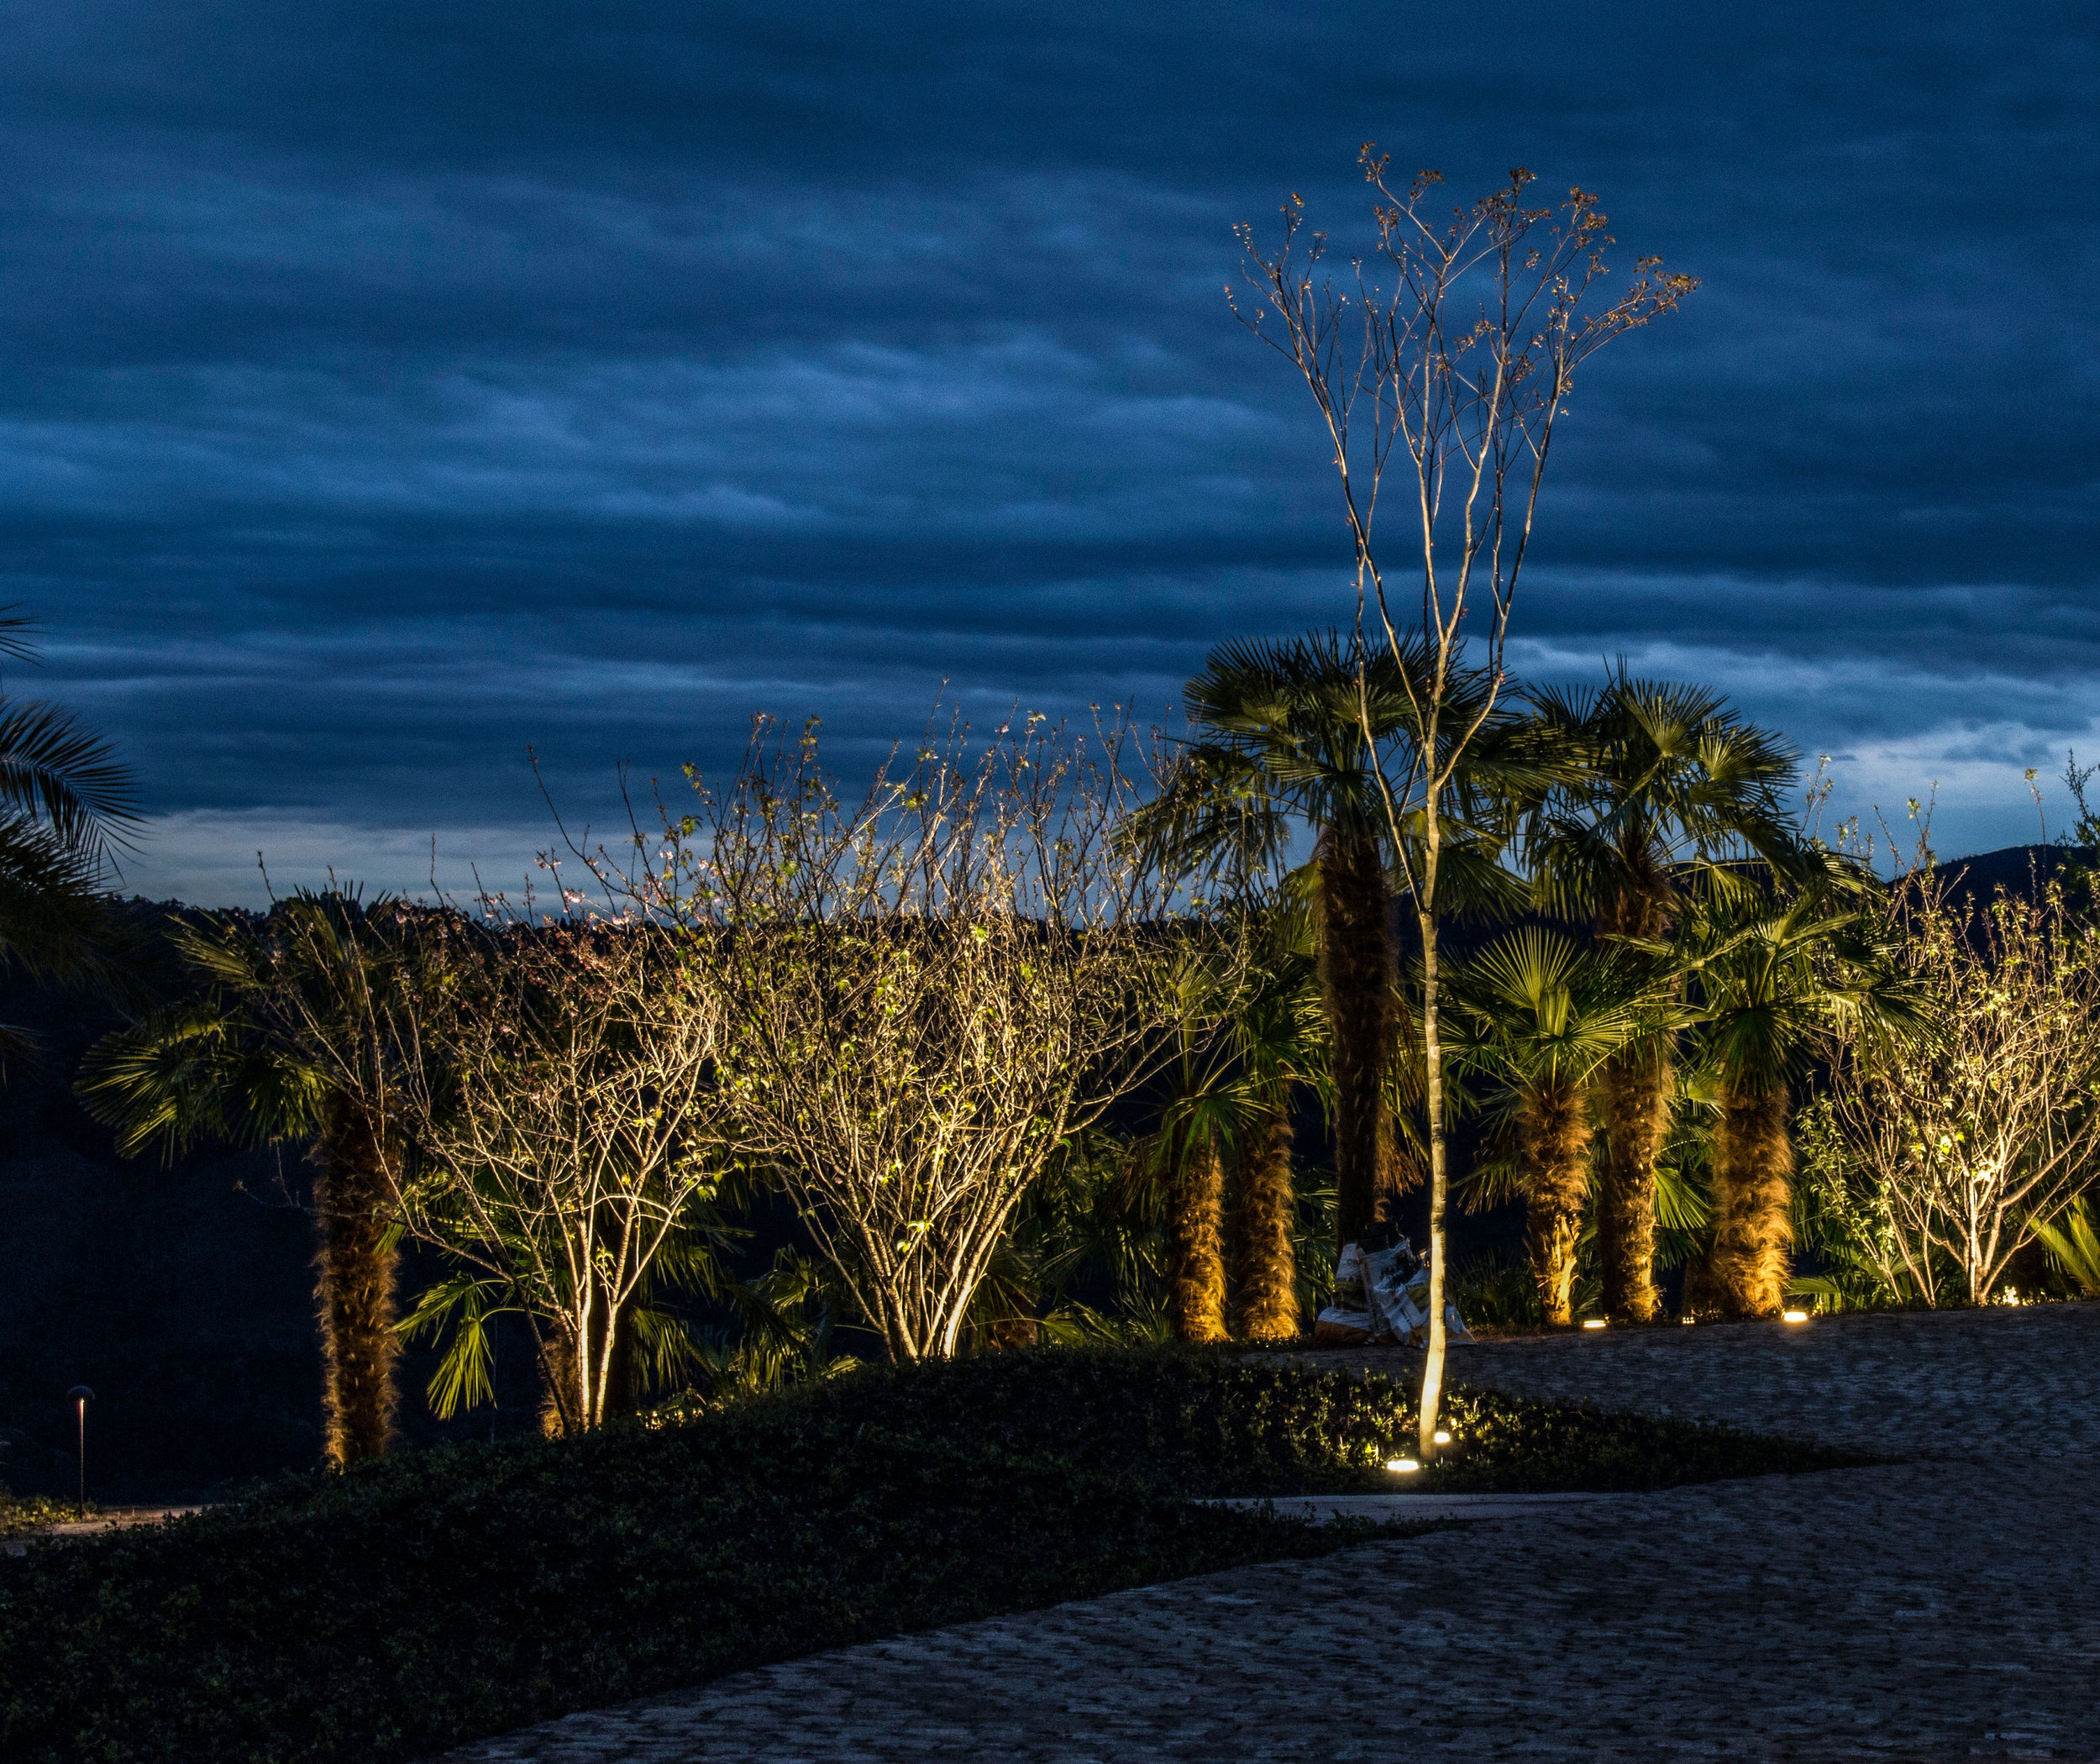 LIGHTSOURCE_Residencia-Campos-do-Jordao _ LC-Orsini_Abbud-Aguiar_005.jpg